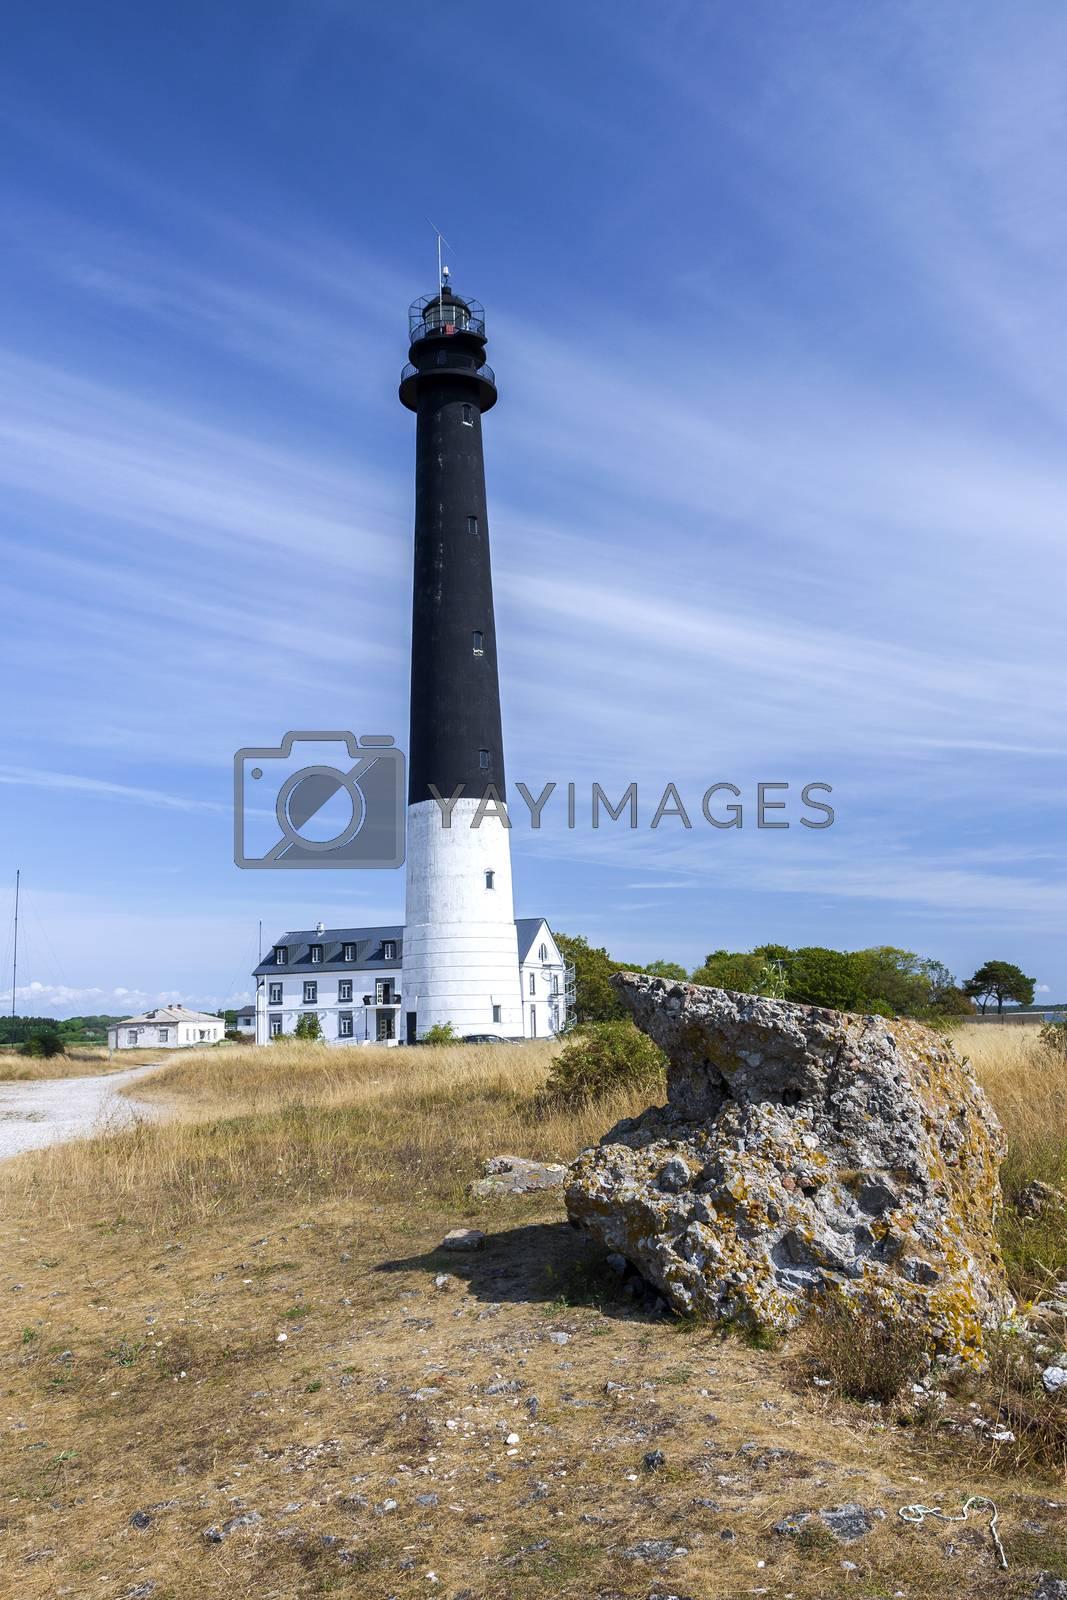 Remoted lighthouse in Saaremaa island, Estonia